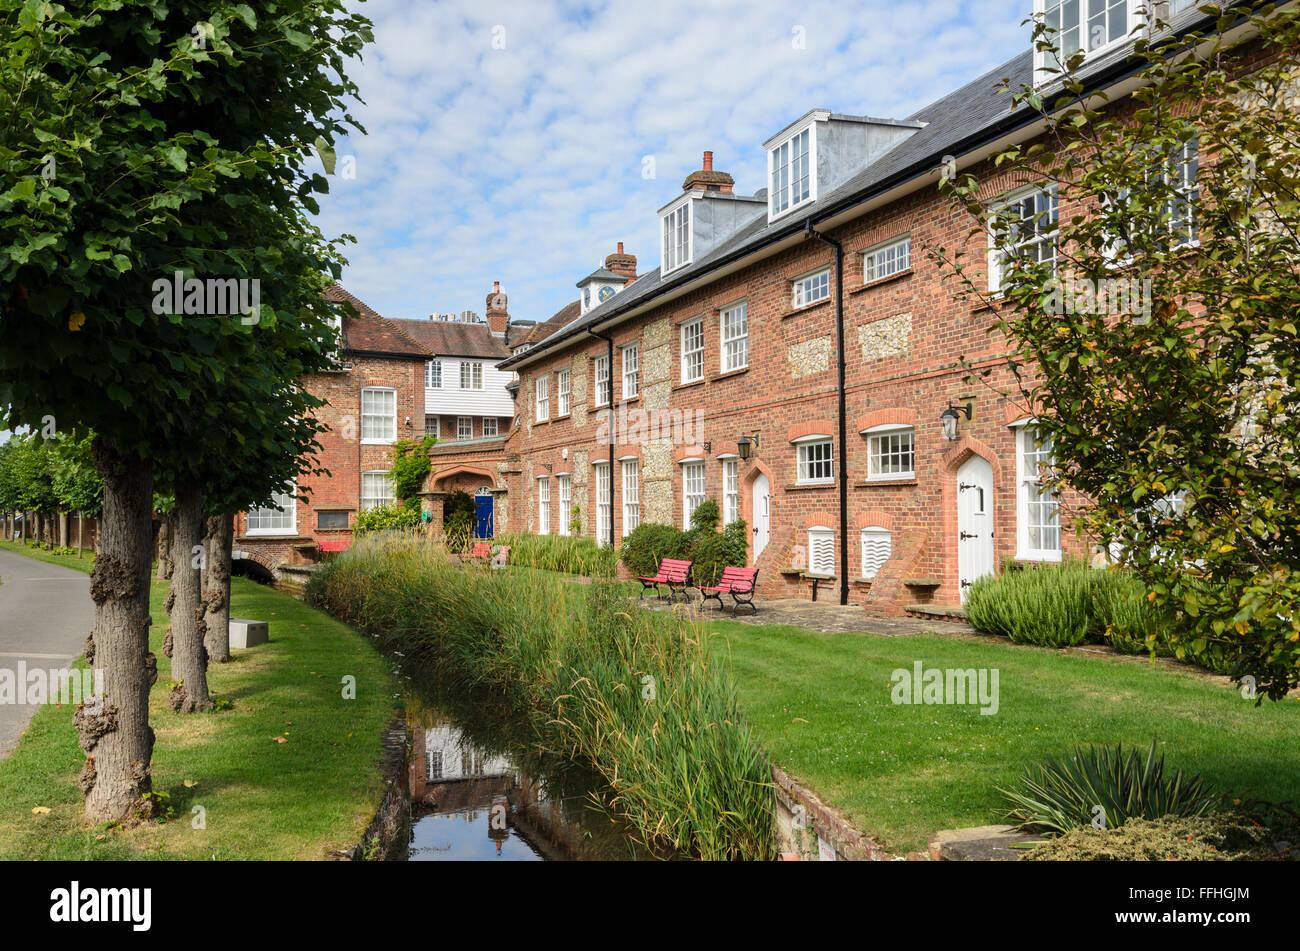 Homes in Old Amersham, Amersham, Buckinghamshire, England, UK. Stock Photo